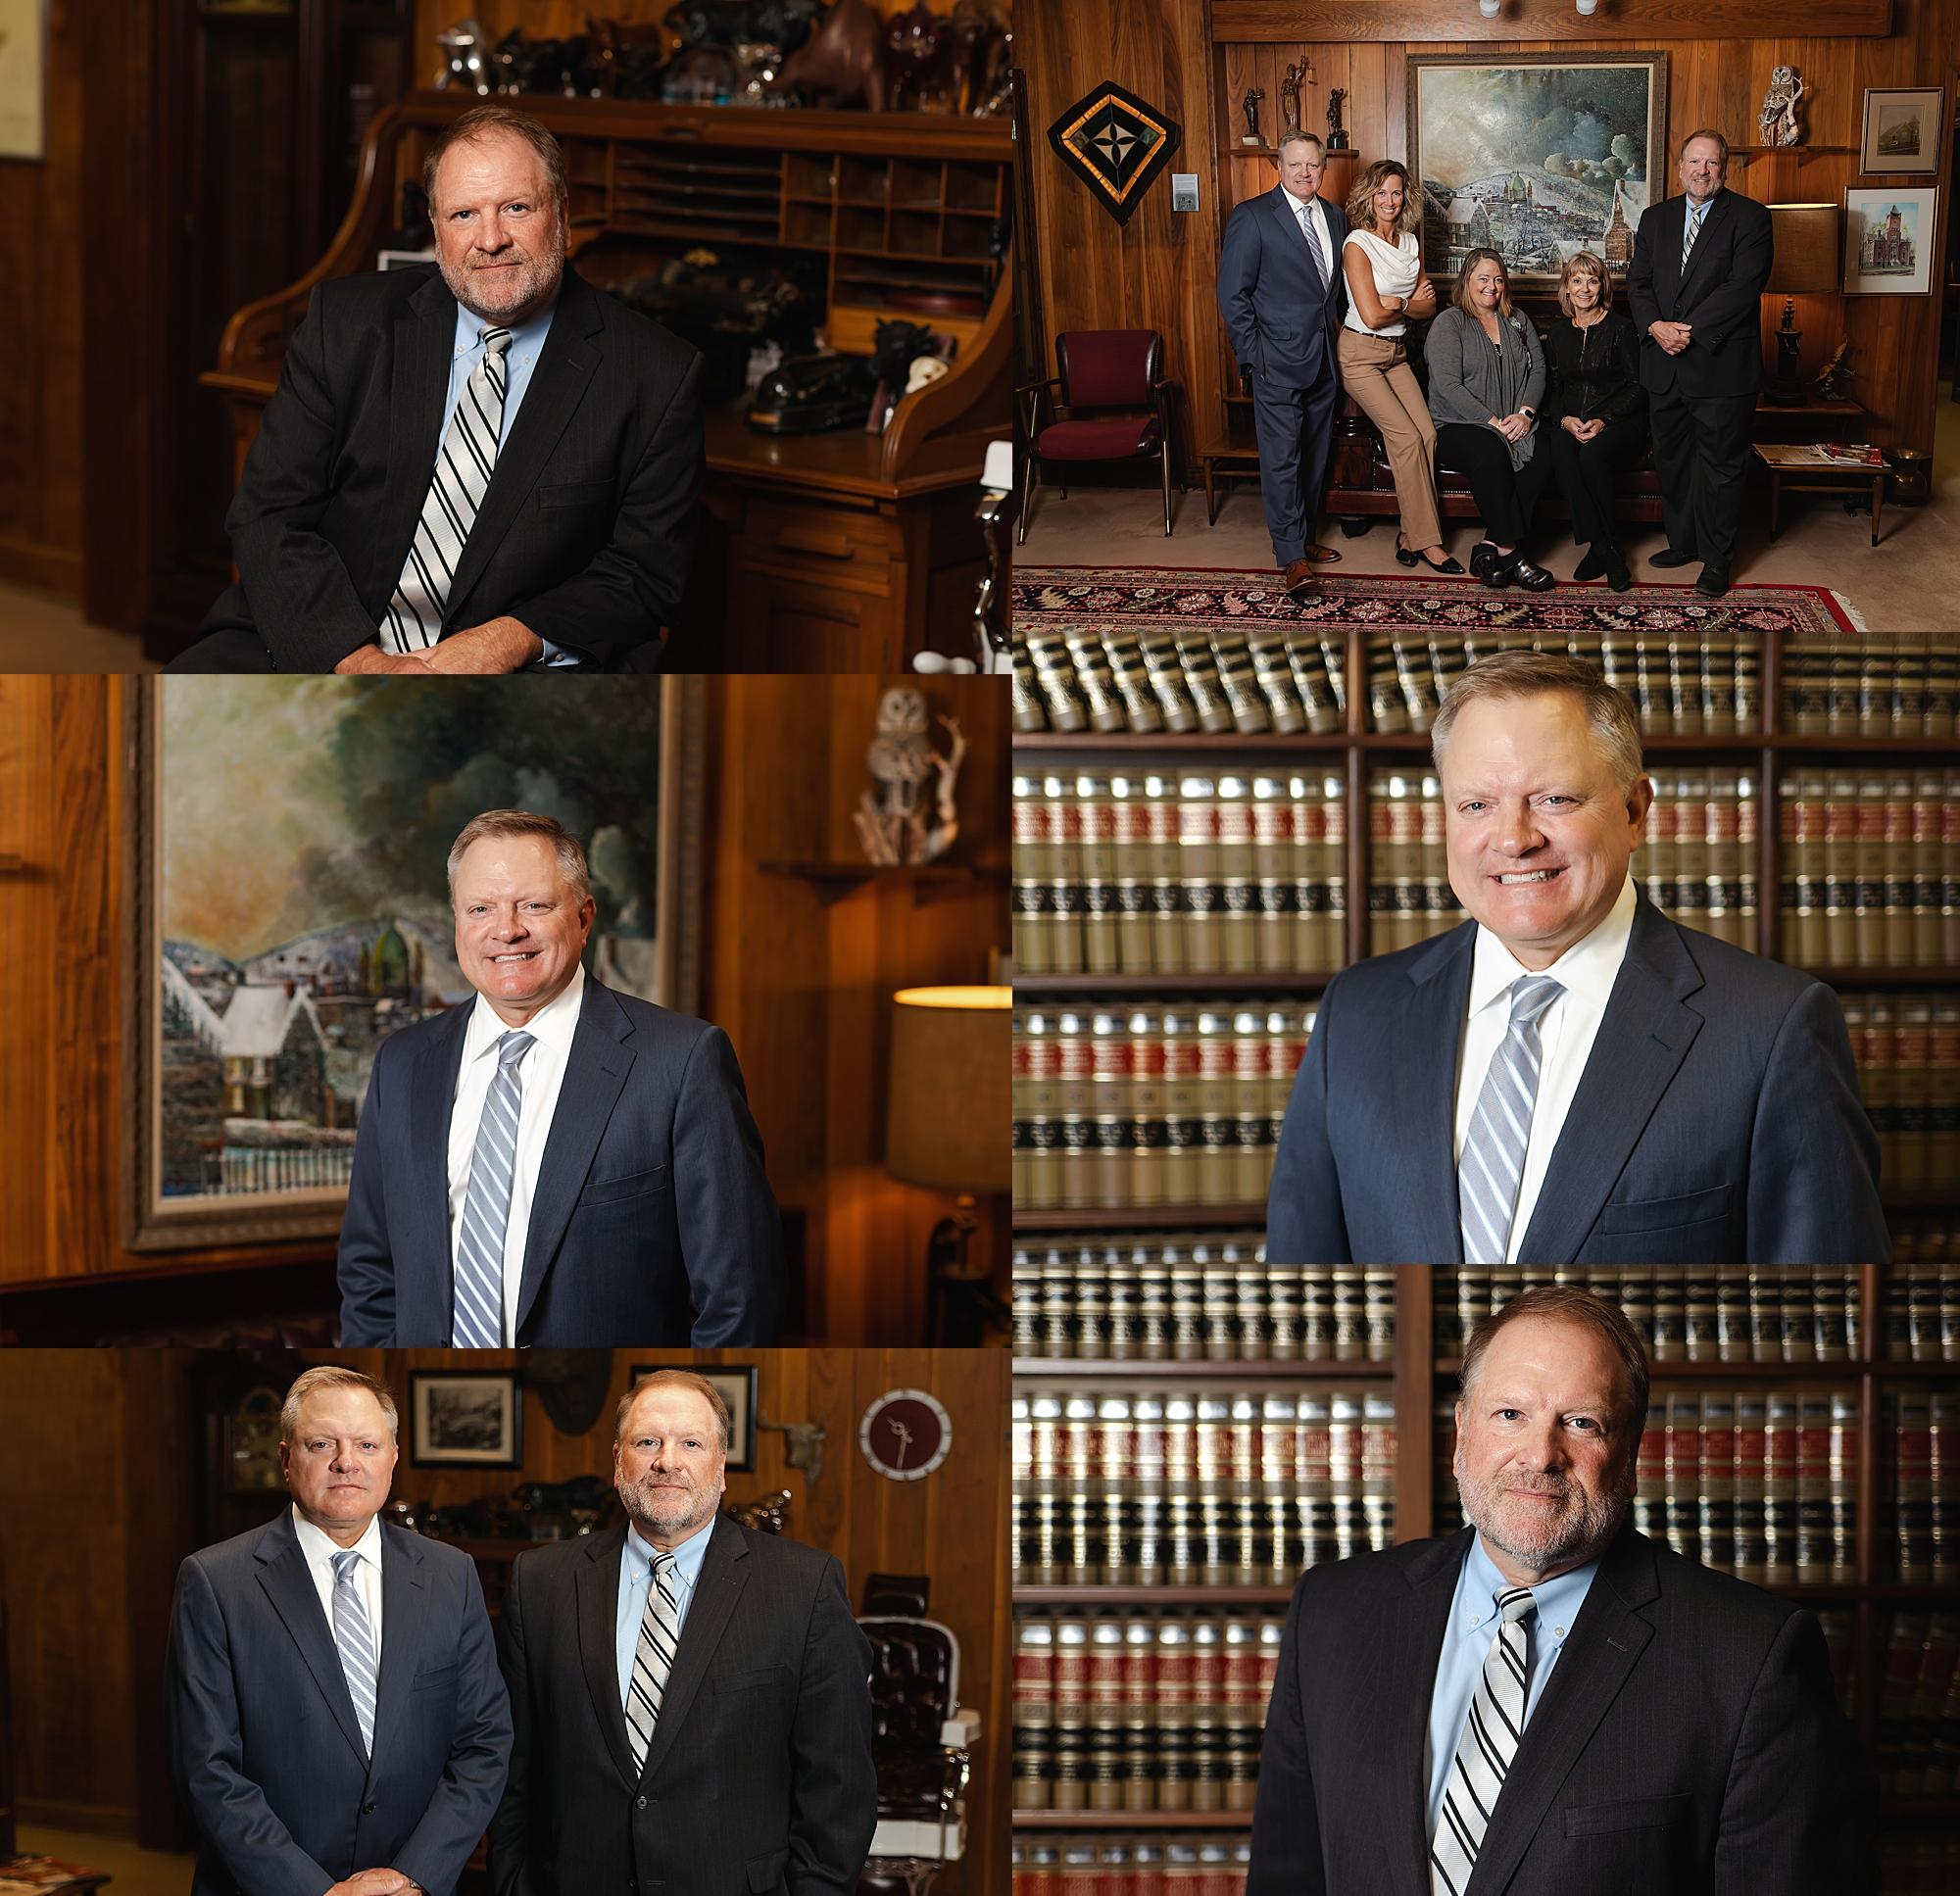 business_photoshoo_kristina_rose_photography_lawyer